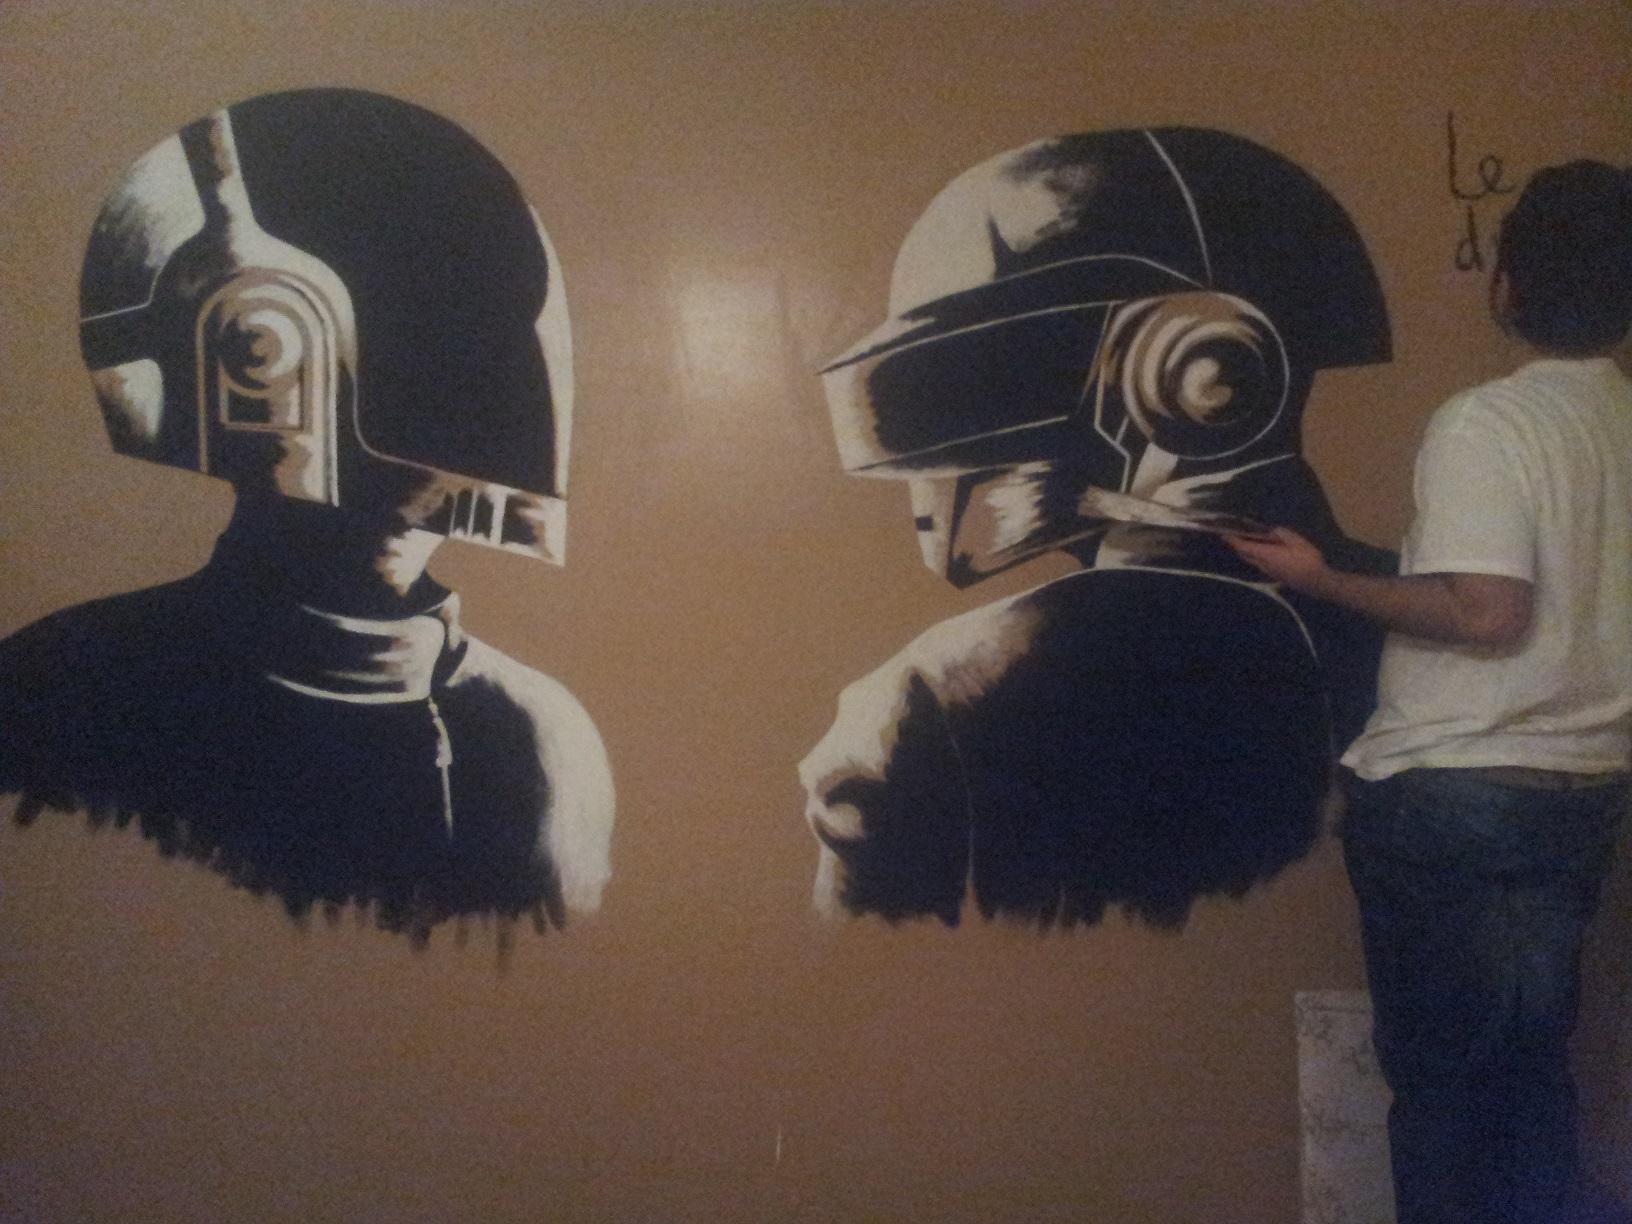 daft punk mural 1 by msv123 on deviantart